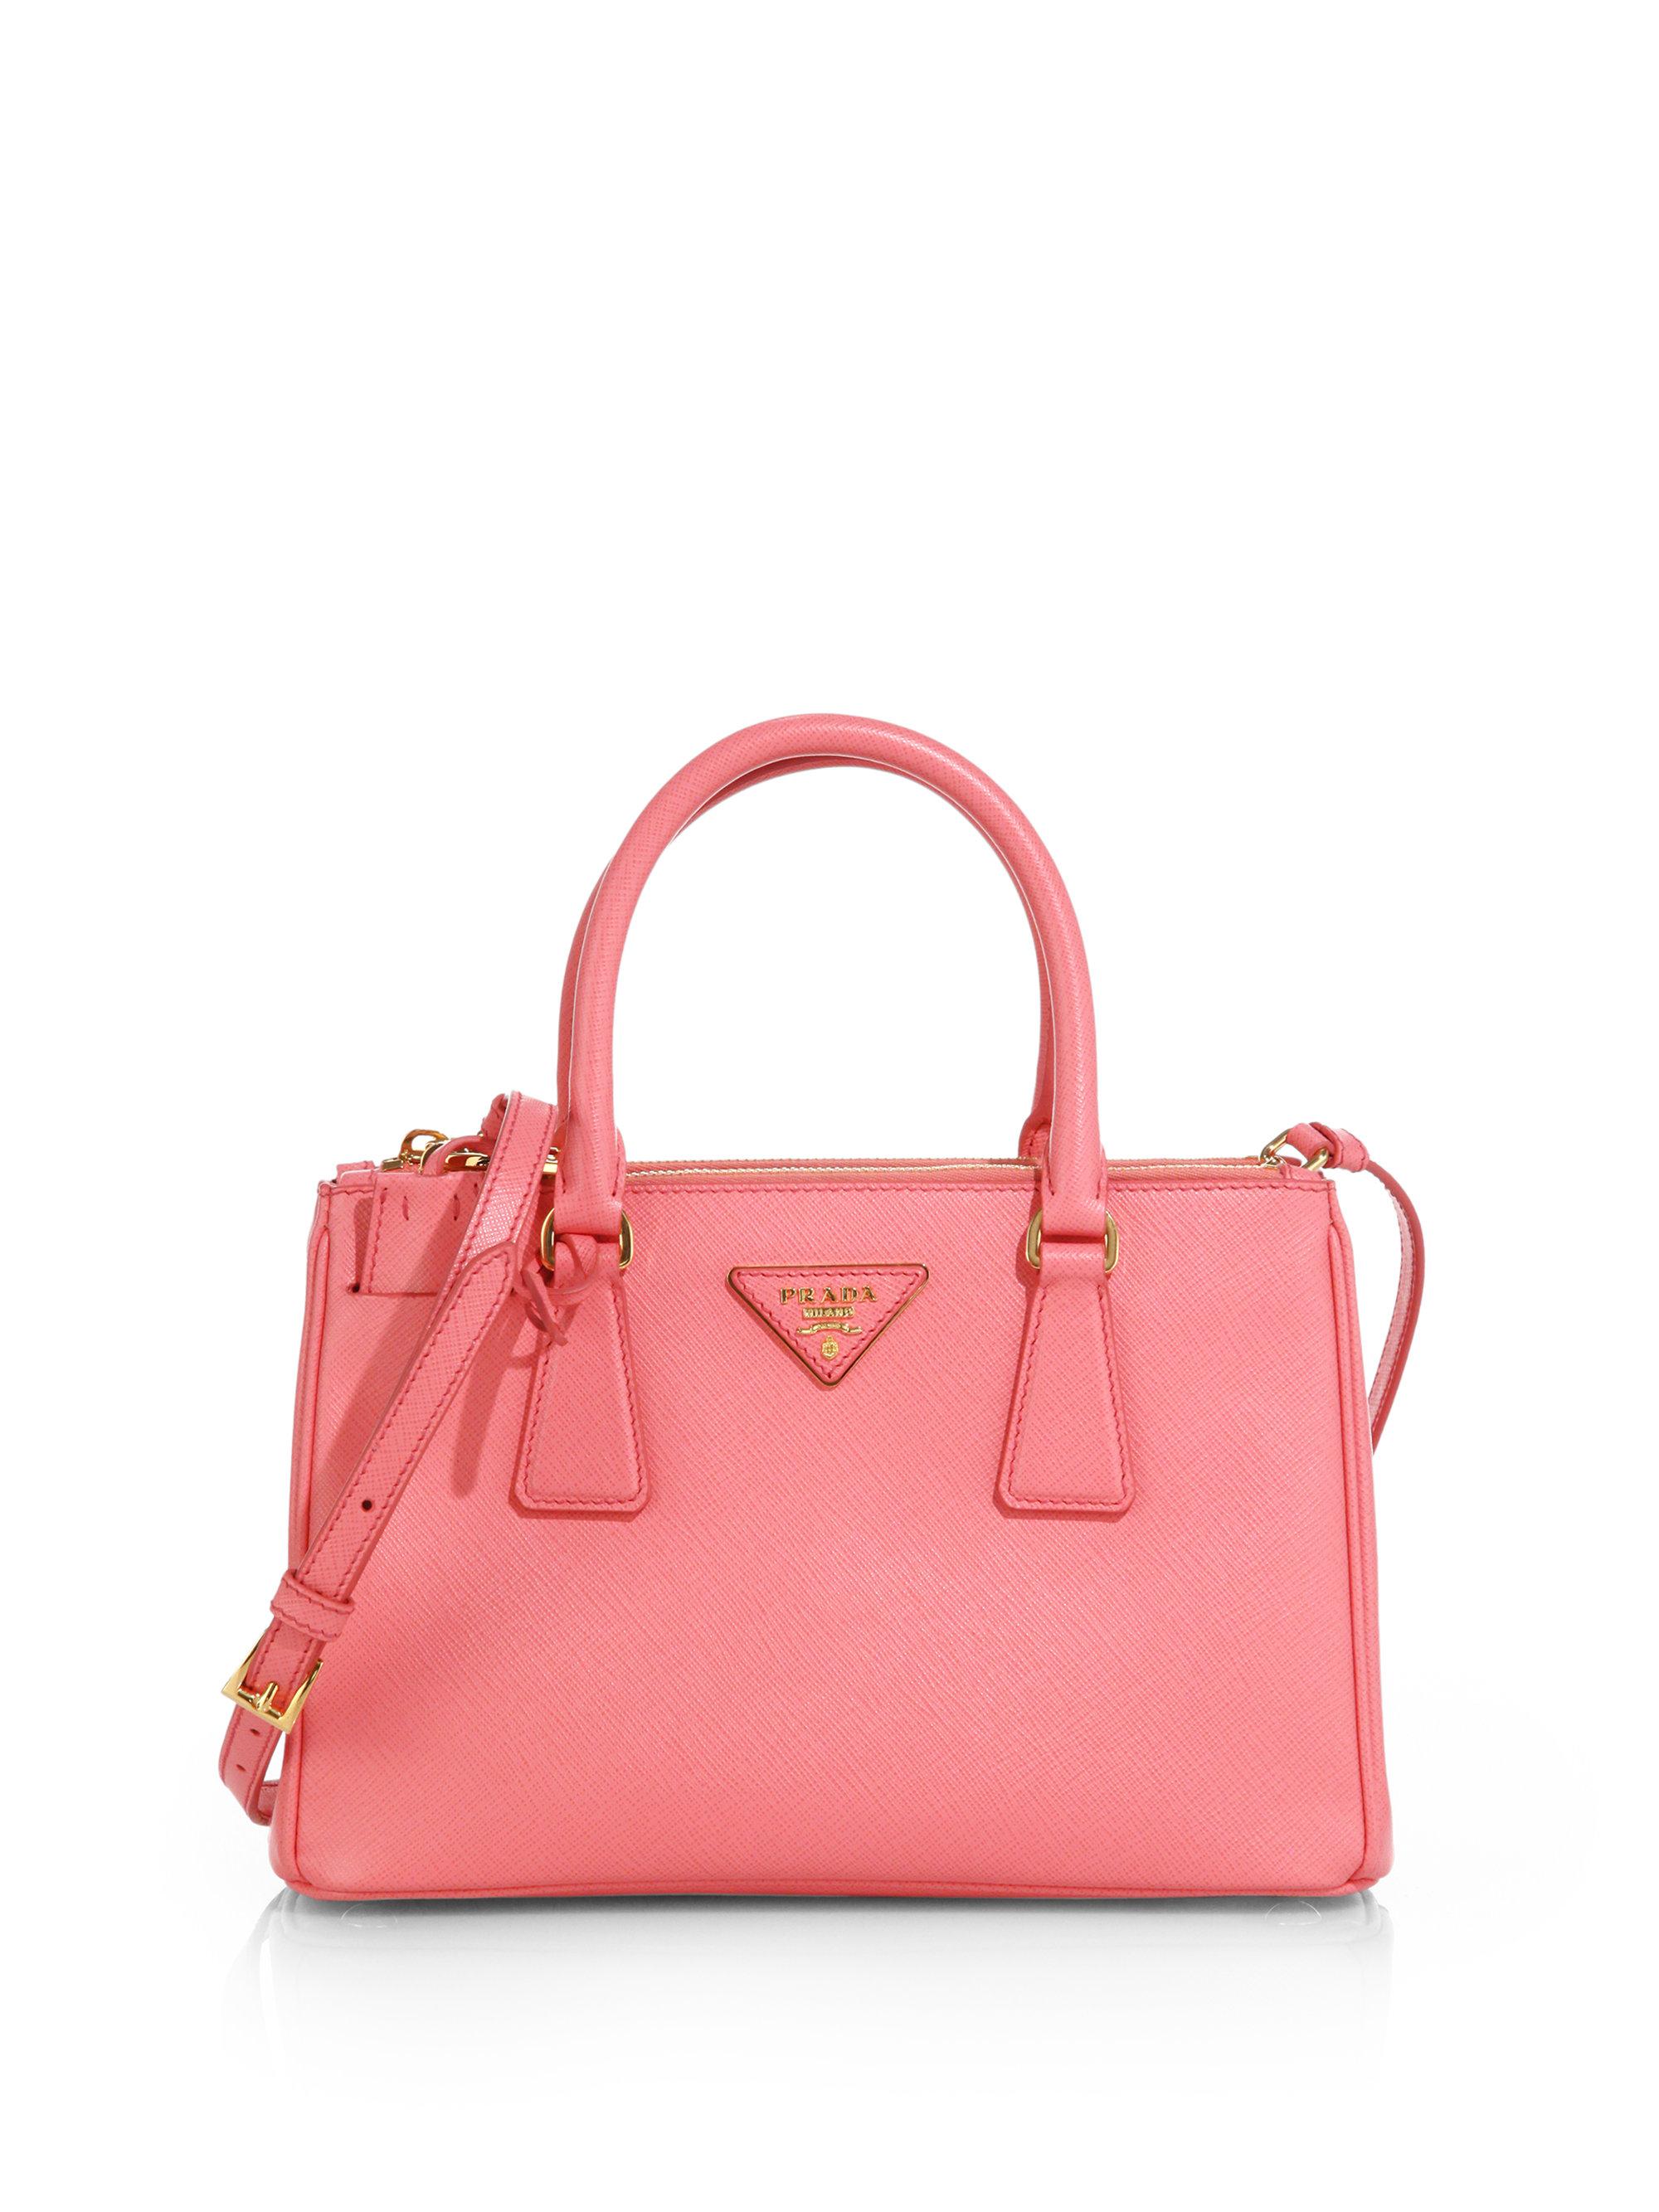 prada messenger bag black - Prada Saffiano Lux Small Double-zip Tote in Pink (GERANIO-PINK)   Lyst